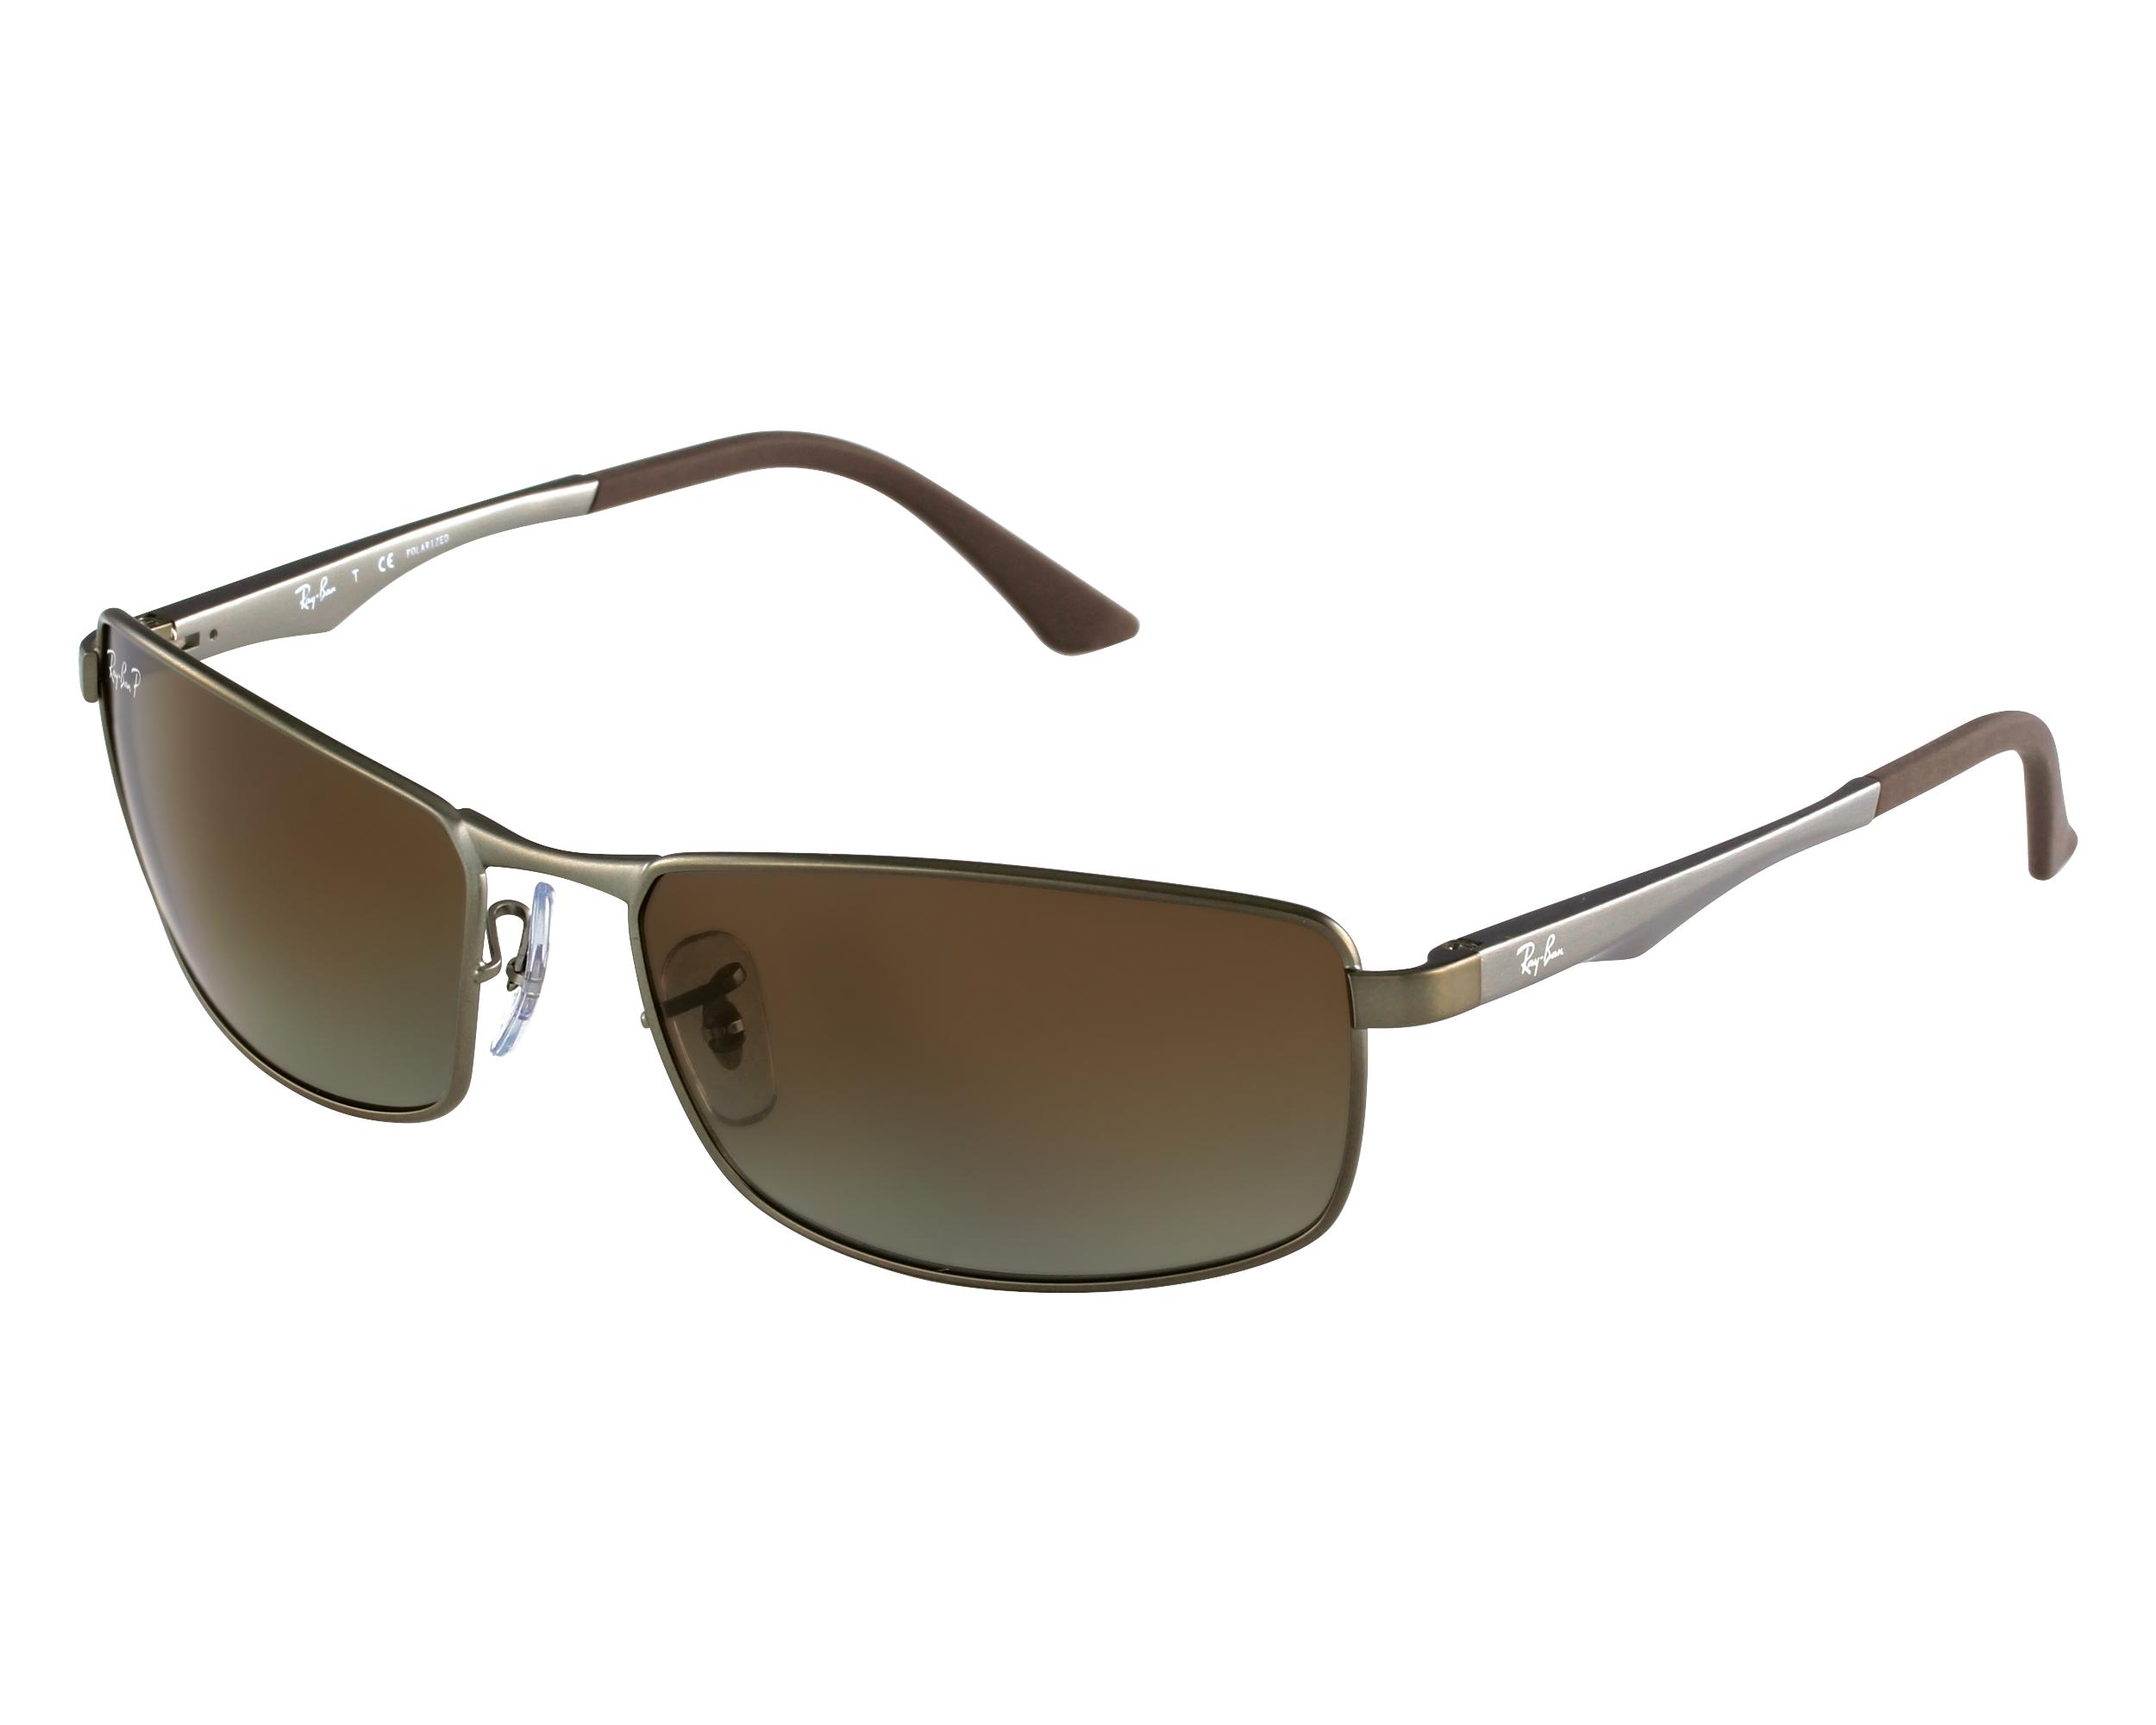 ab3f0d499cf Rayban Sunglasses 3498 Style